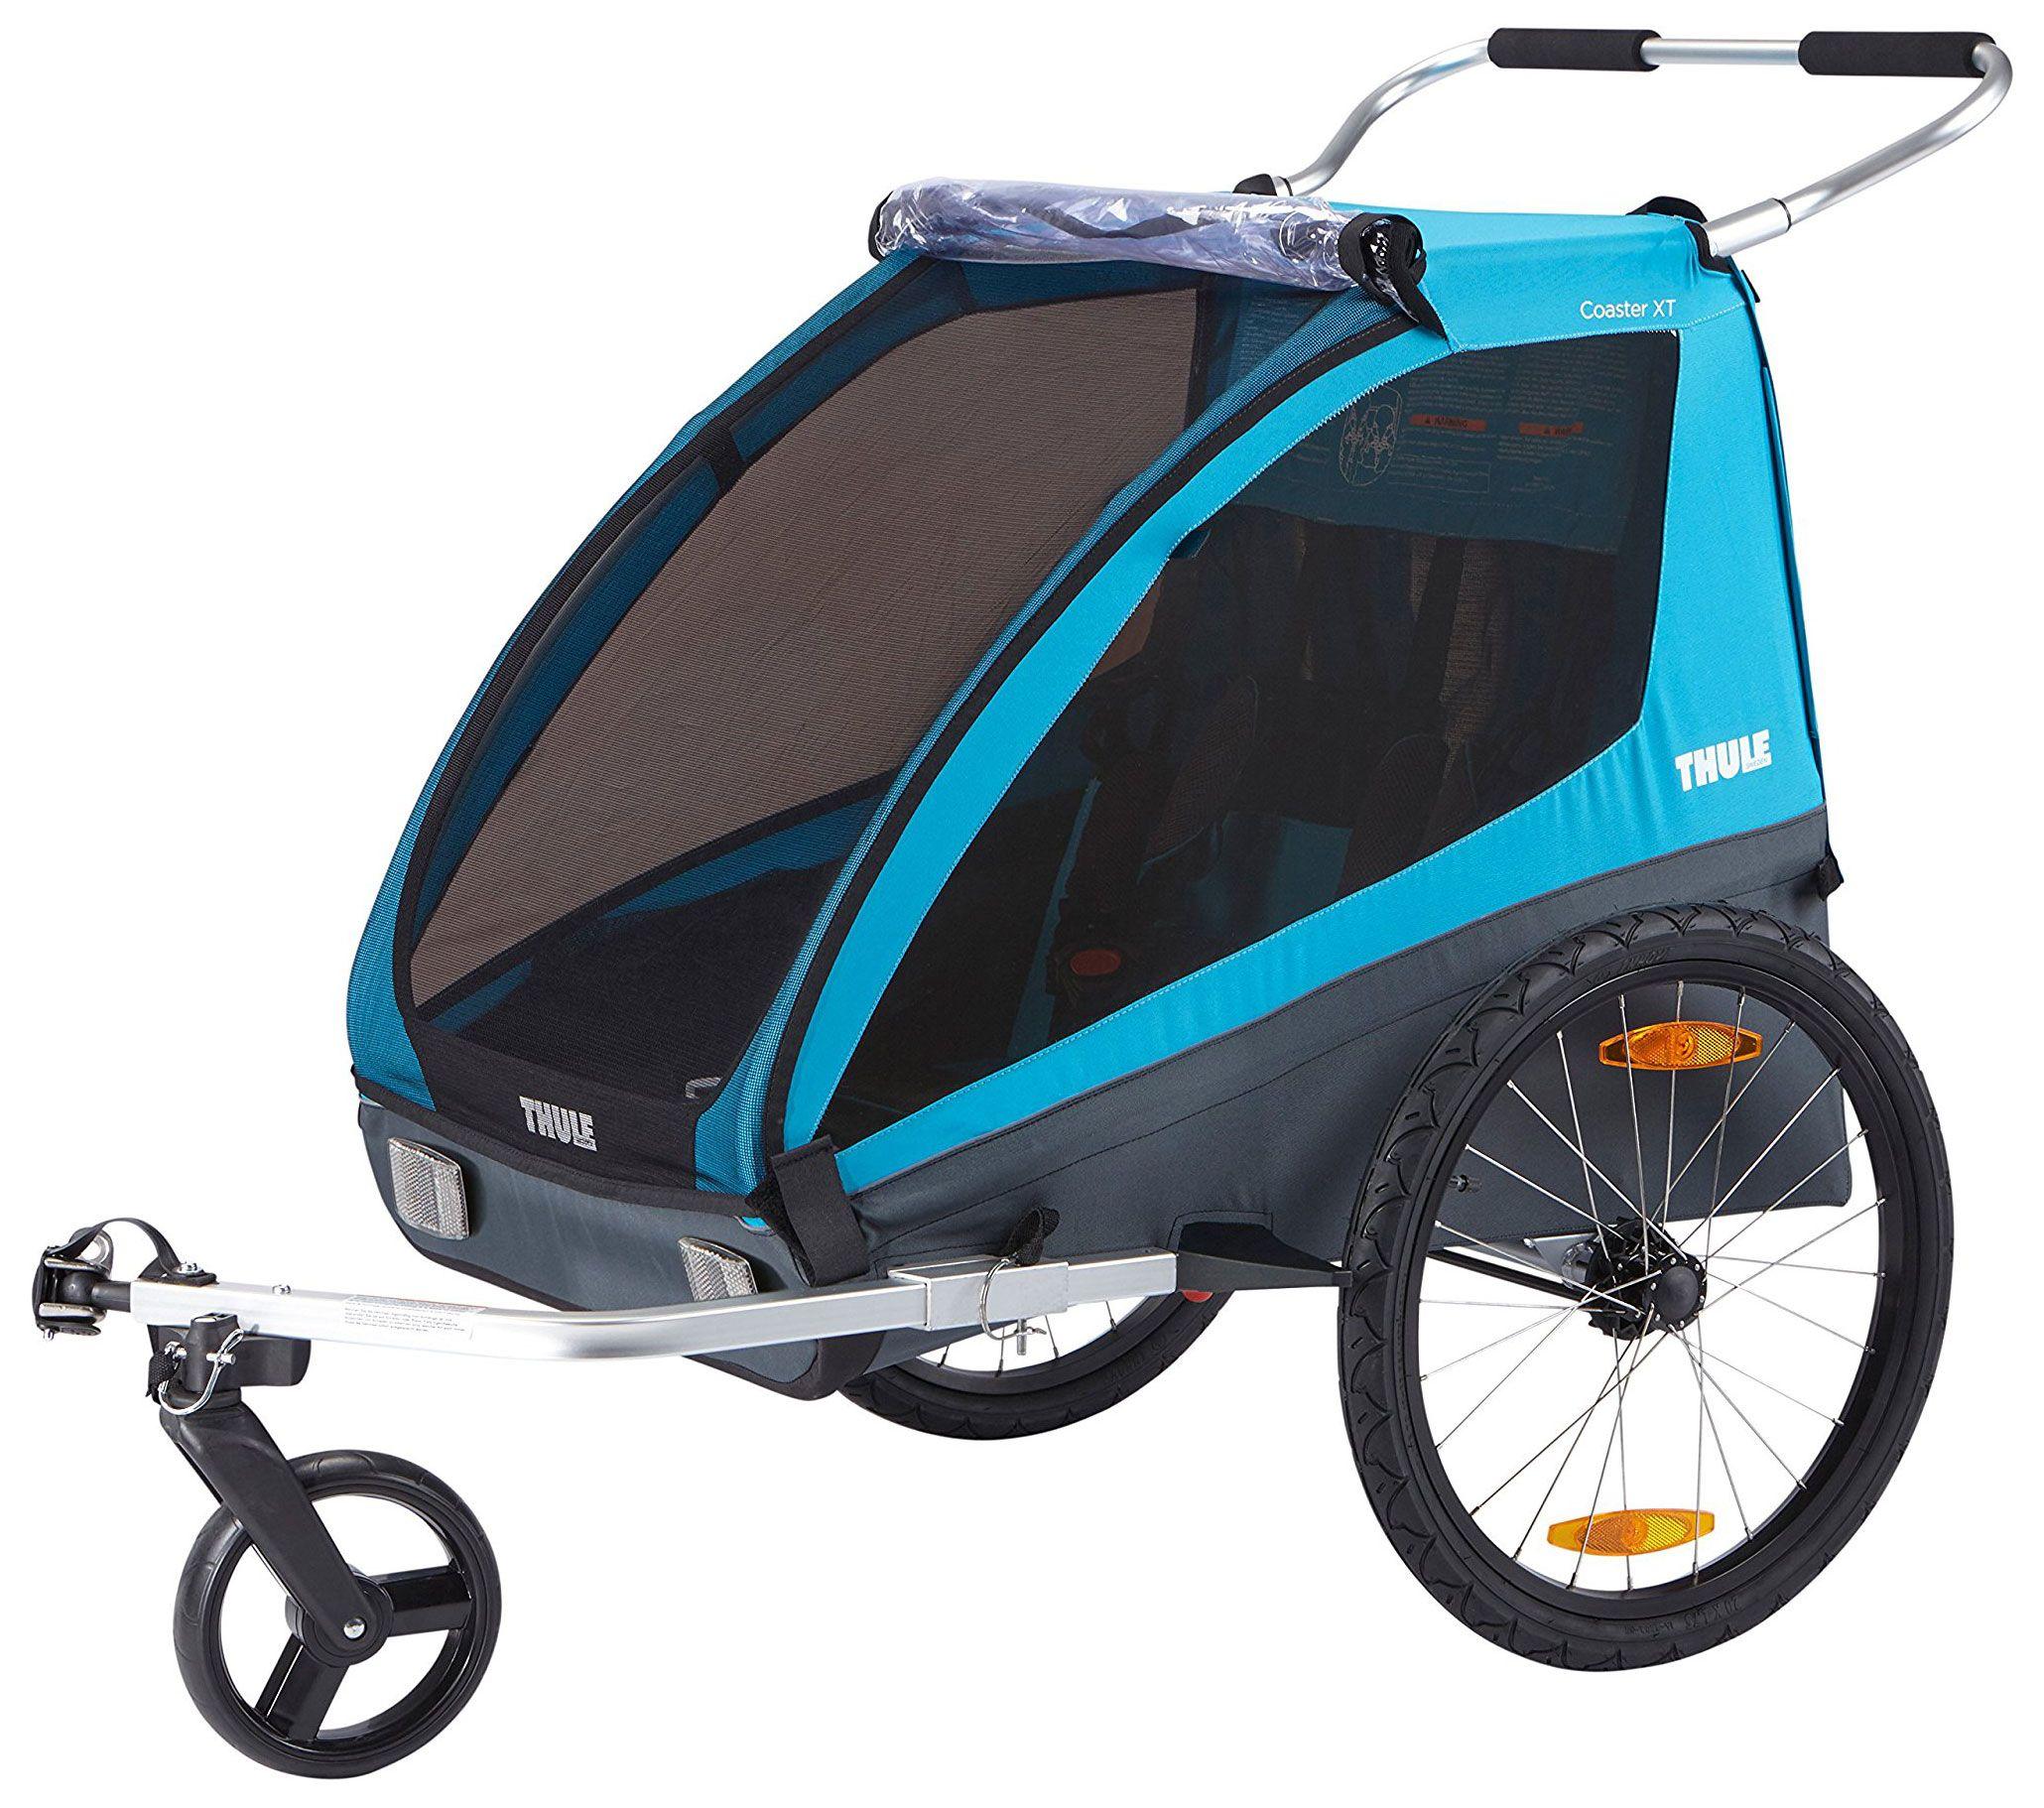 Аксессуар THULE Coaster XT (с комплектом для прогулочной коляски),  задние  - артикул:281272